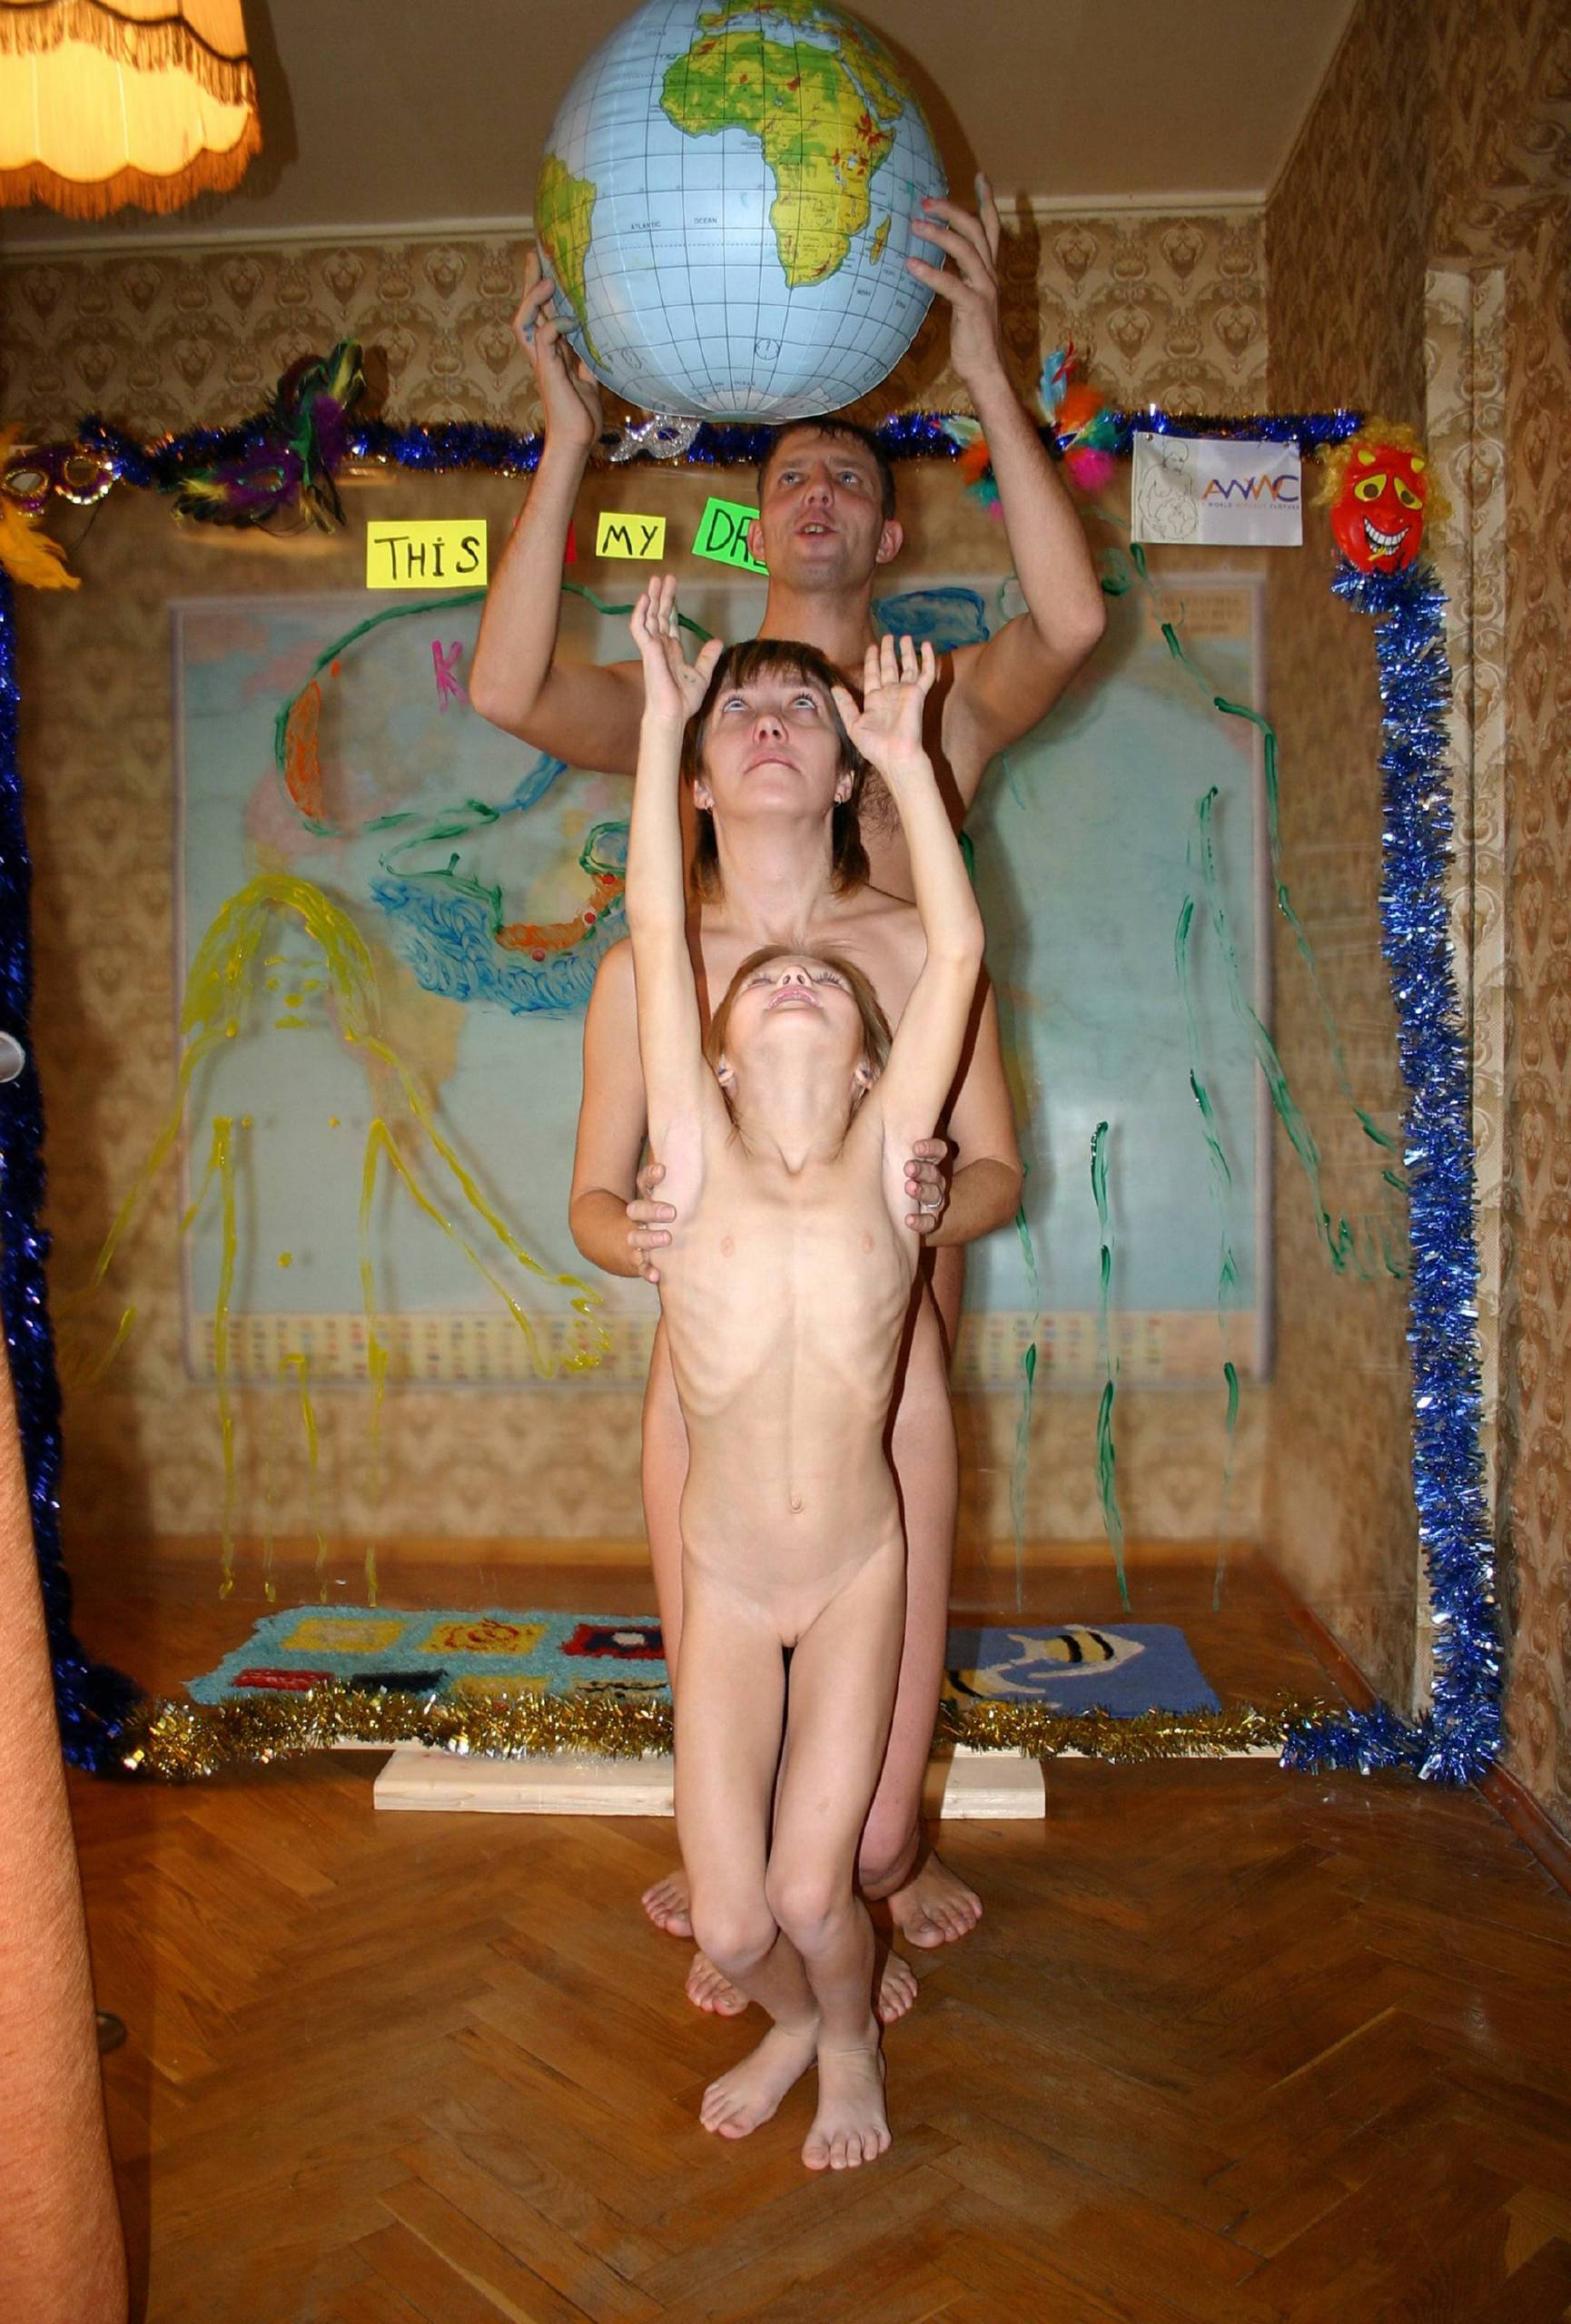 Nudist Photos Introducing Enature World - 1